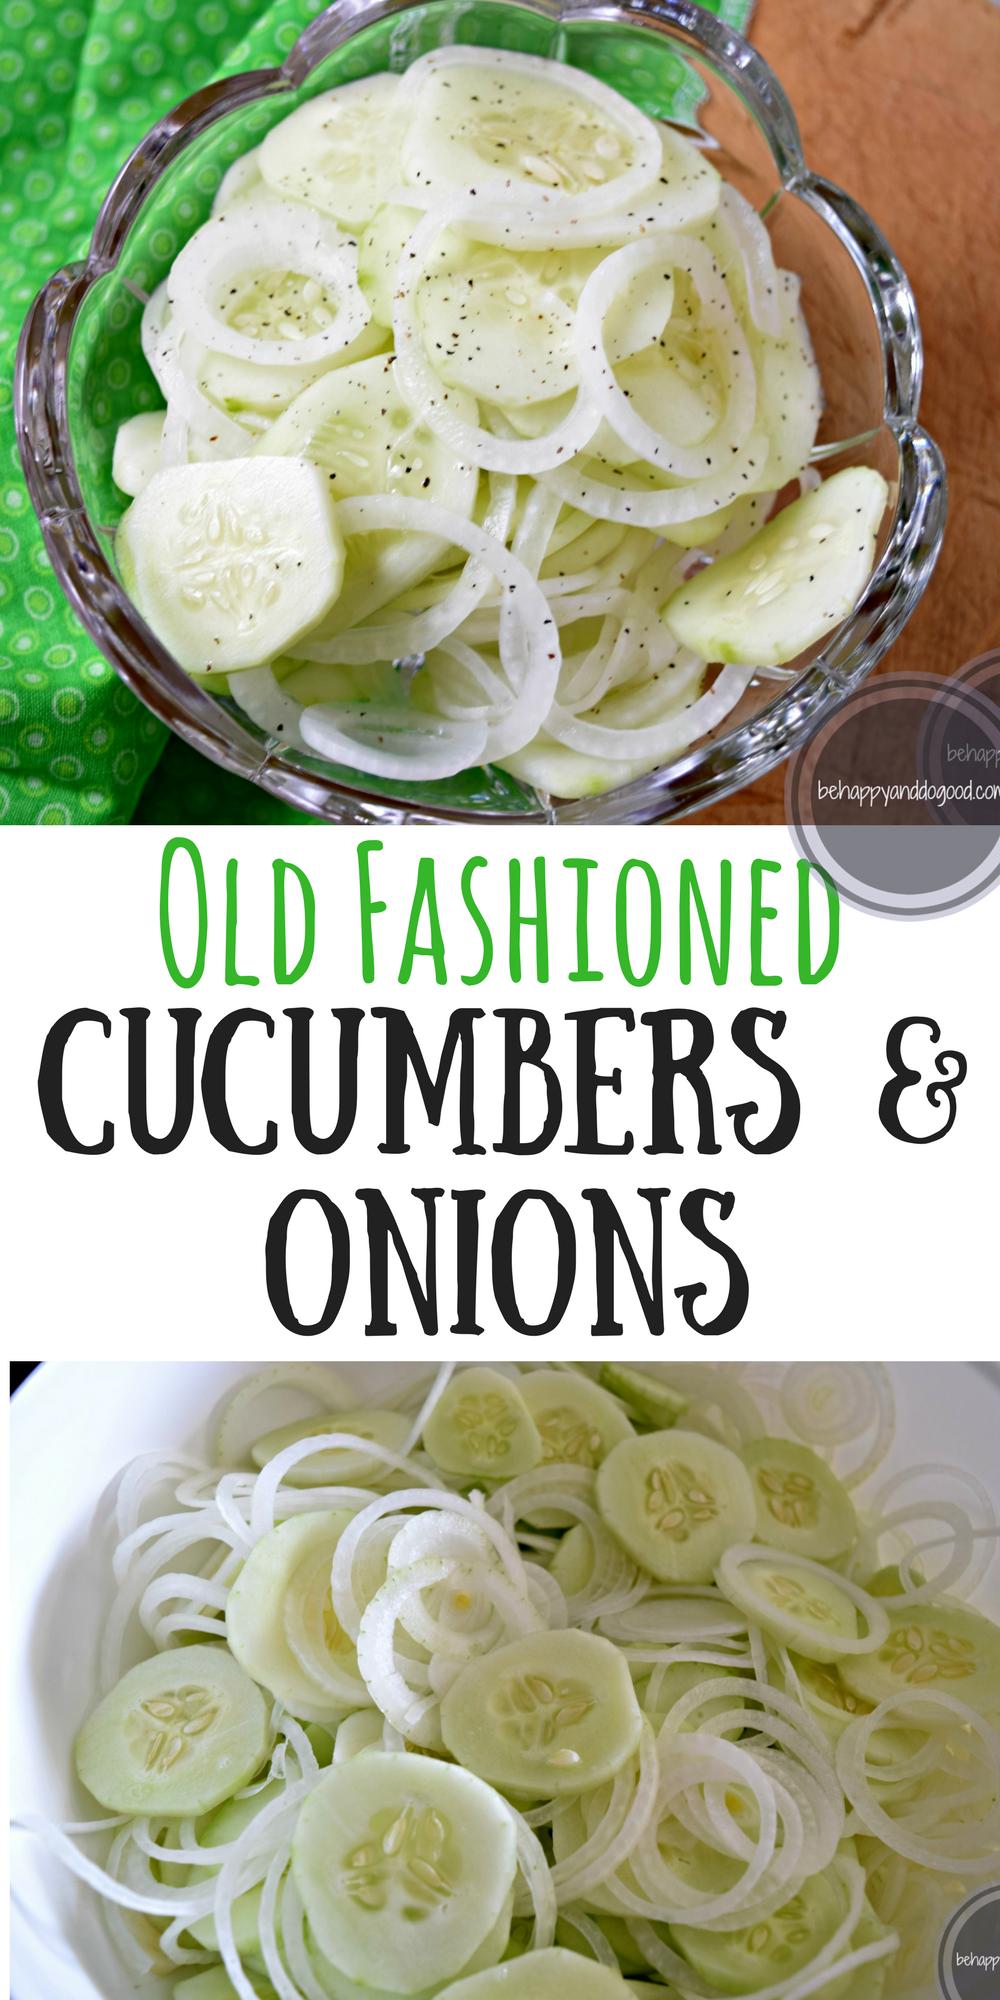 Old Fashioned Cucumber Onion Salad